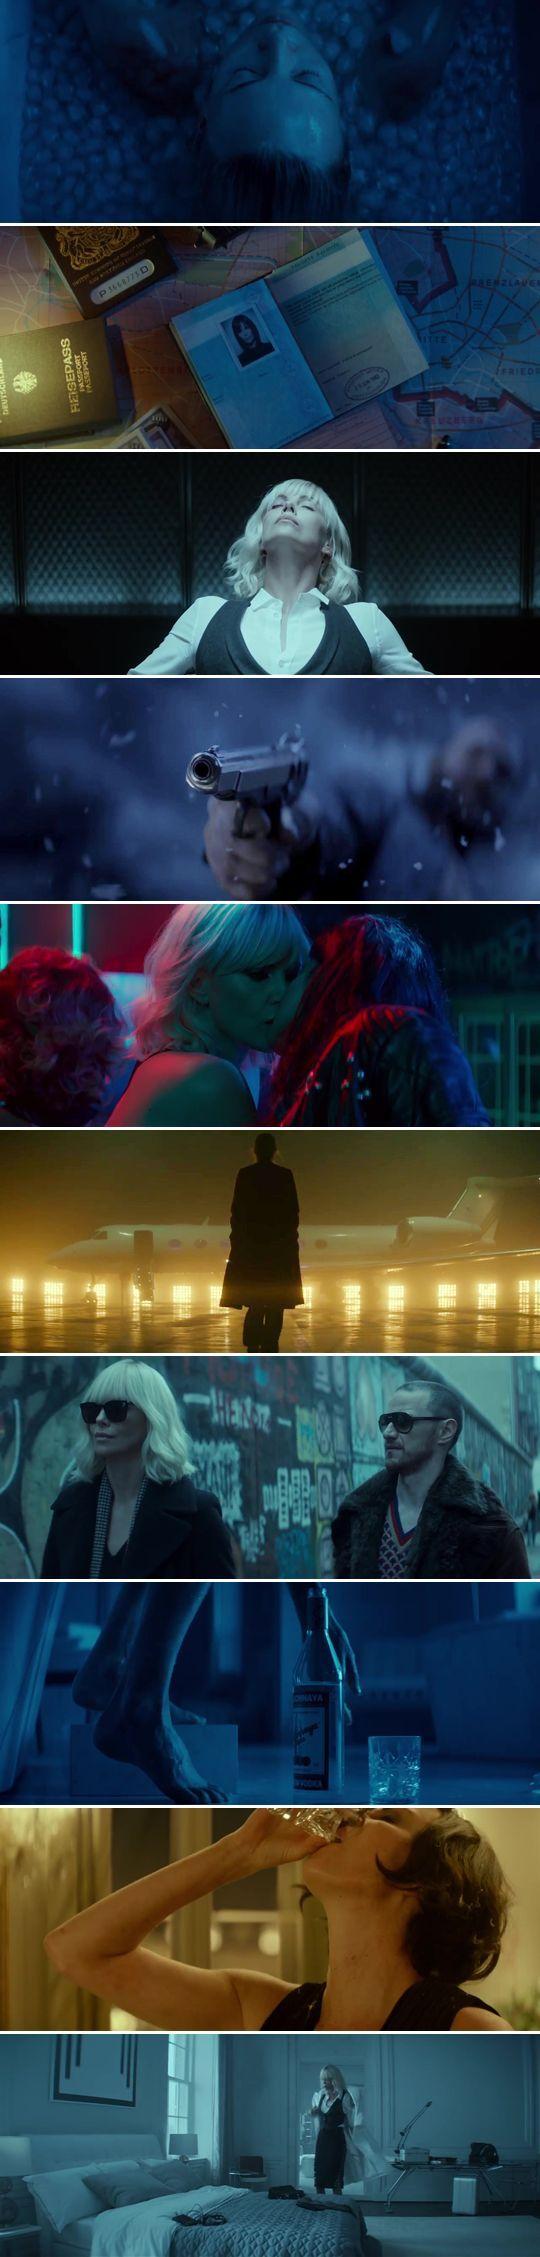 watch Atomic Blonde online free #scenesfrommovies